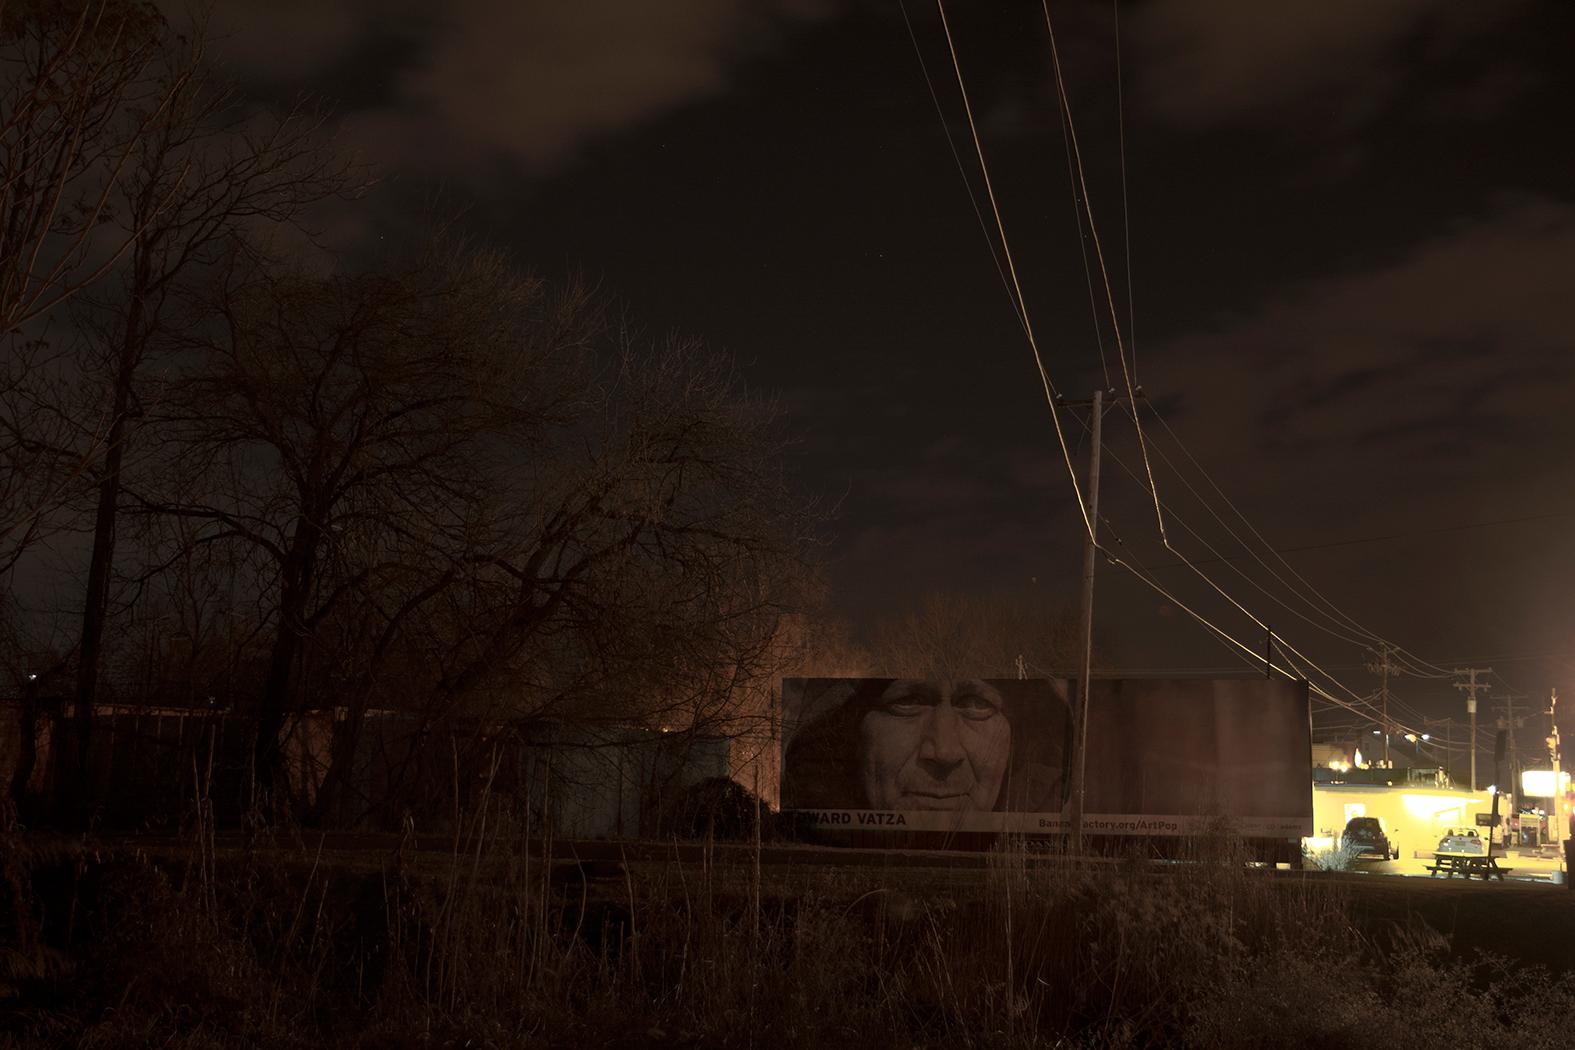 vatza,night,long exposure,dark,moody